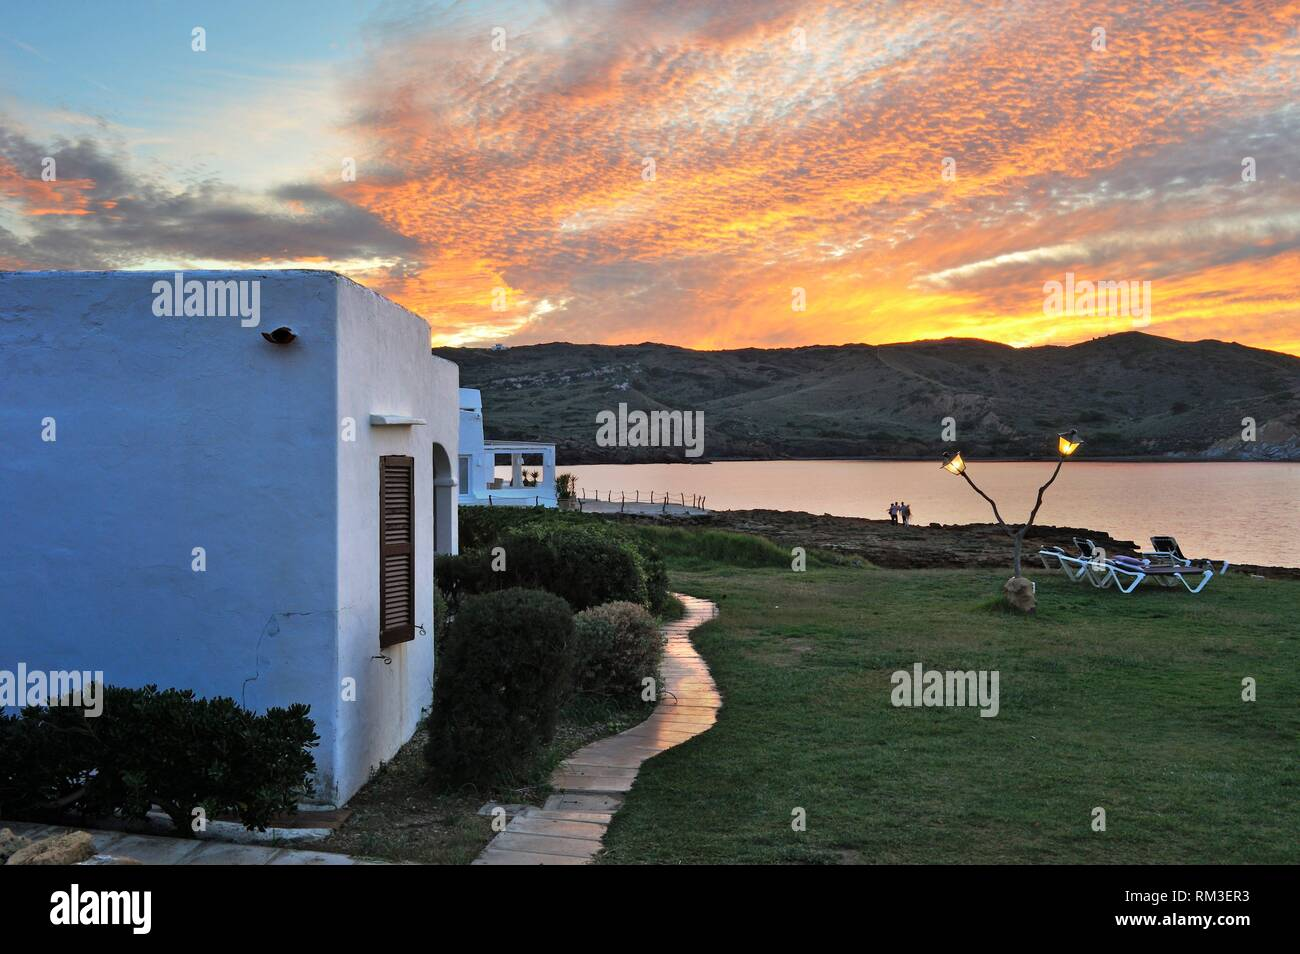 Platges de Fornells, seaside resort, Menorca, Balearic Islands, Spain, Europe. - Stock Image